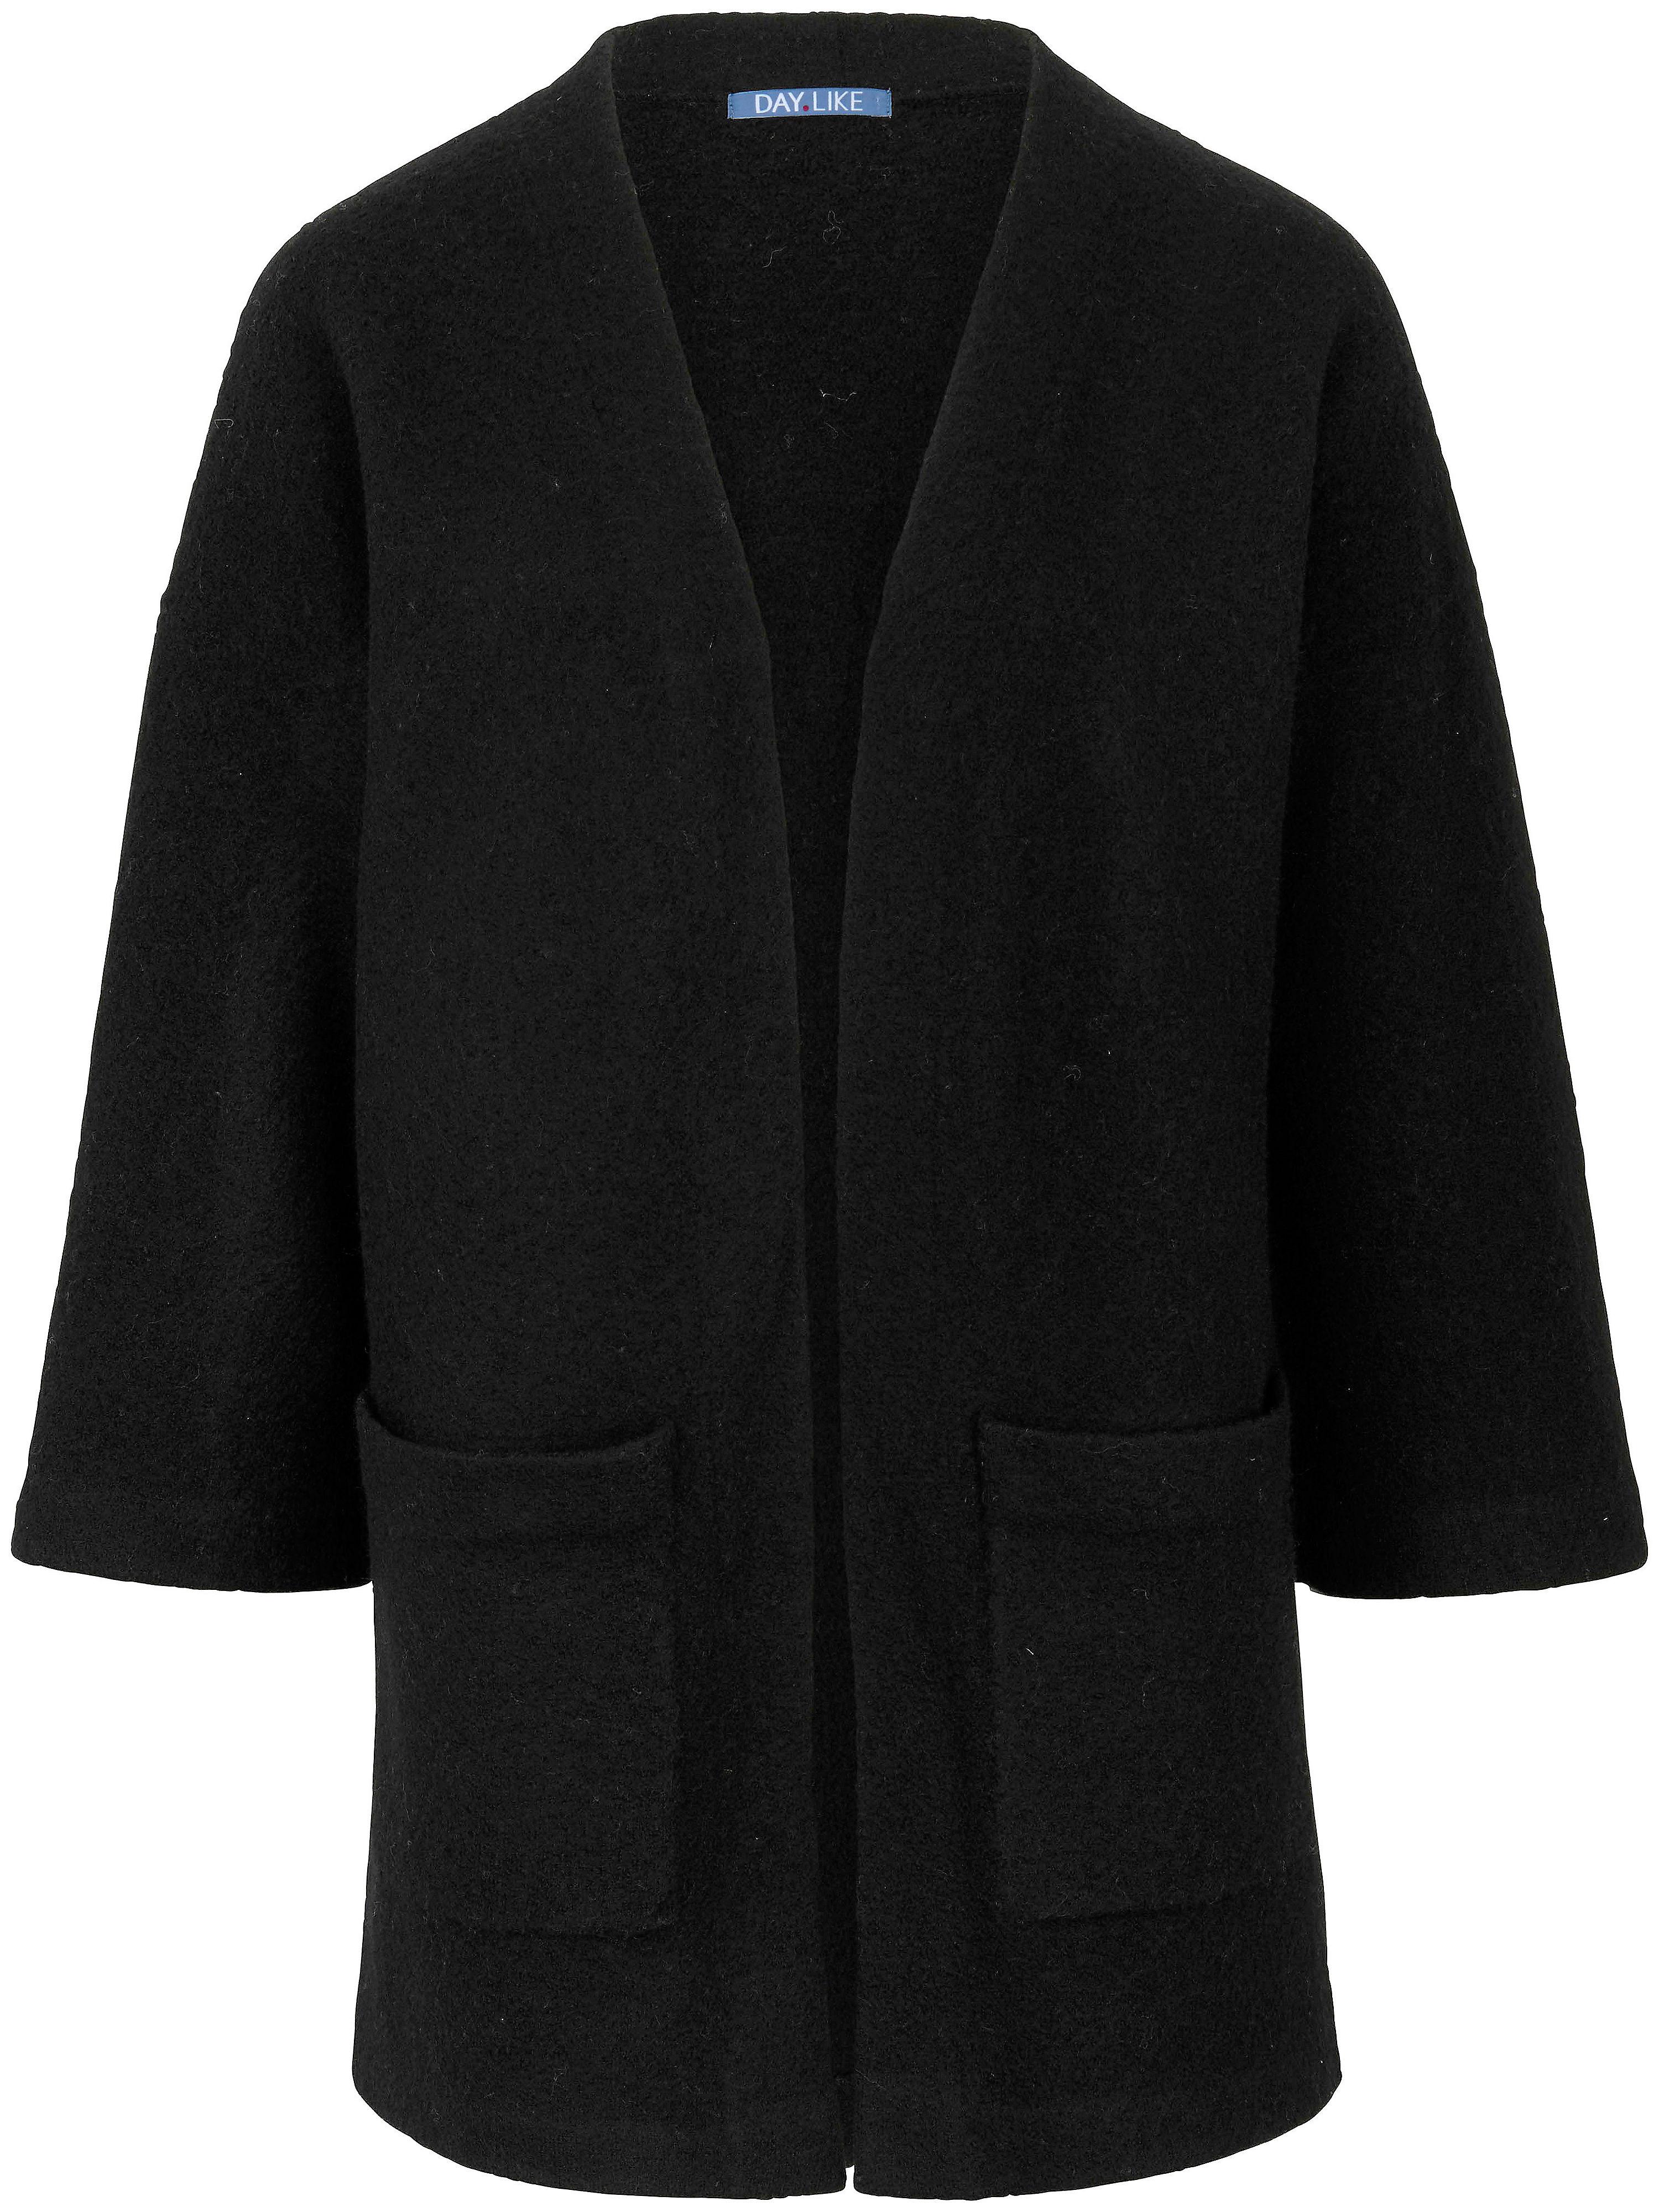 Image of   Cardigan i 100% ren ny uld Fra DAY.LIKE sort